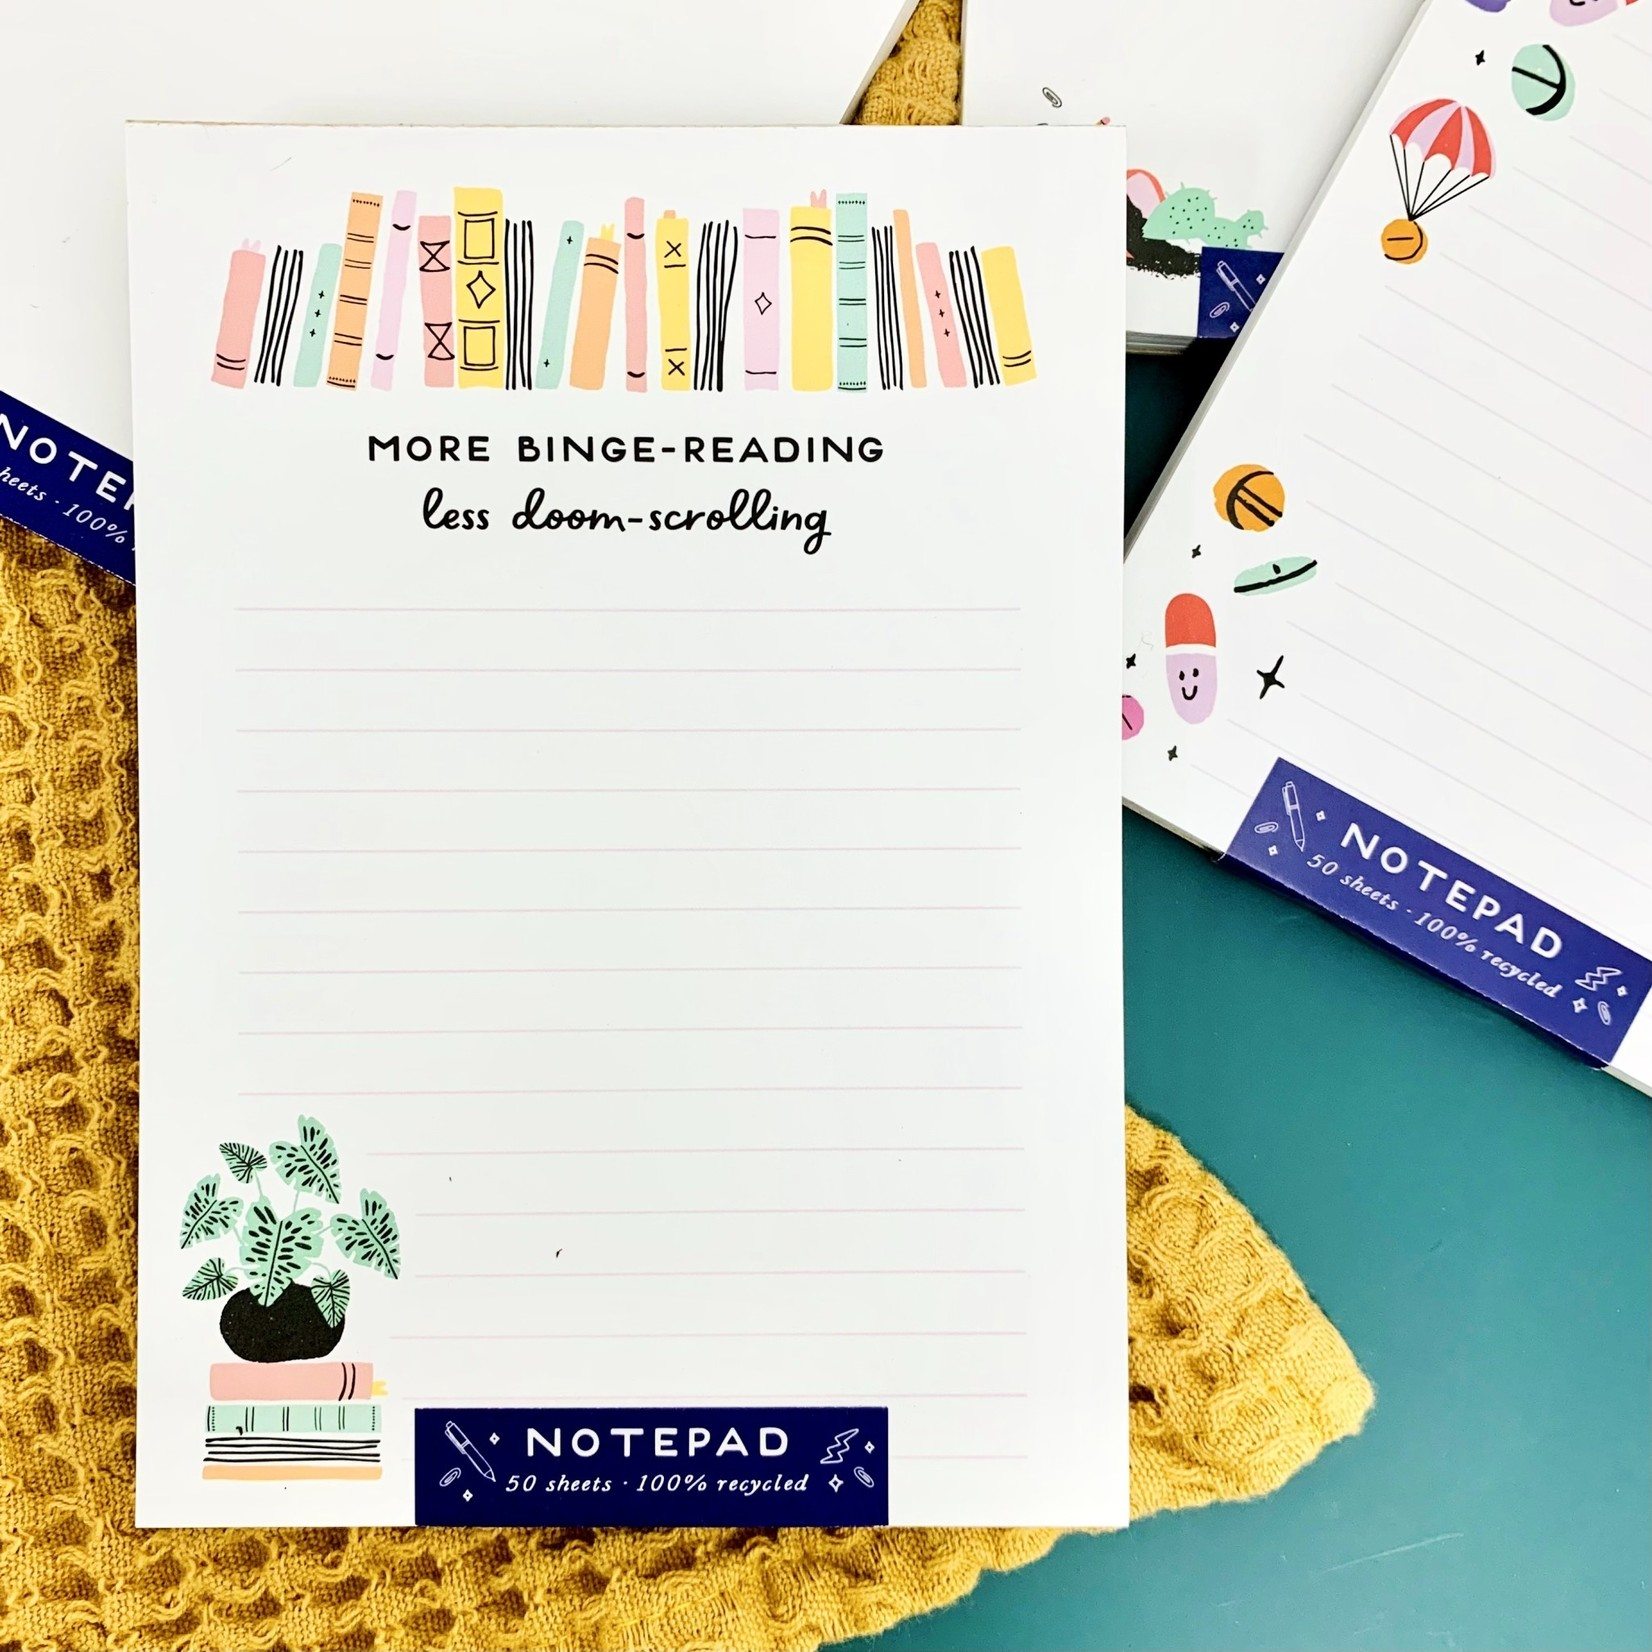 Binge-Reading Notepad